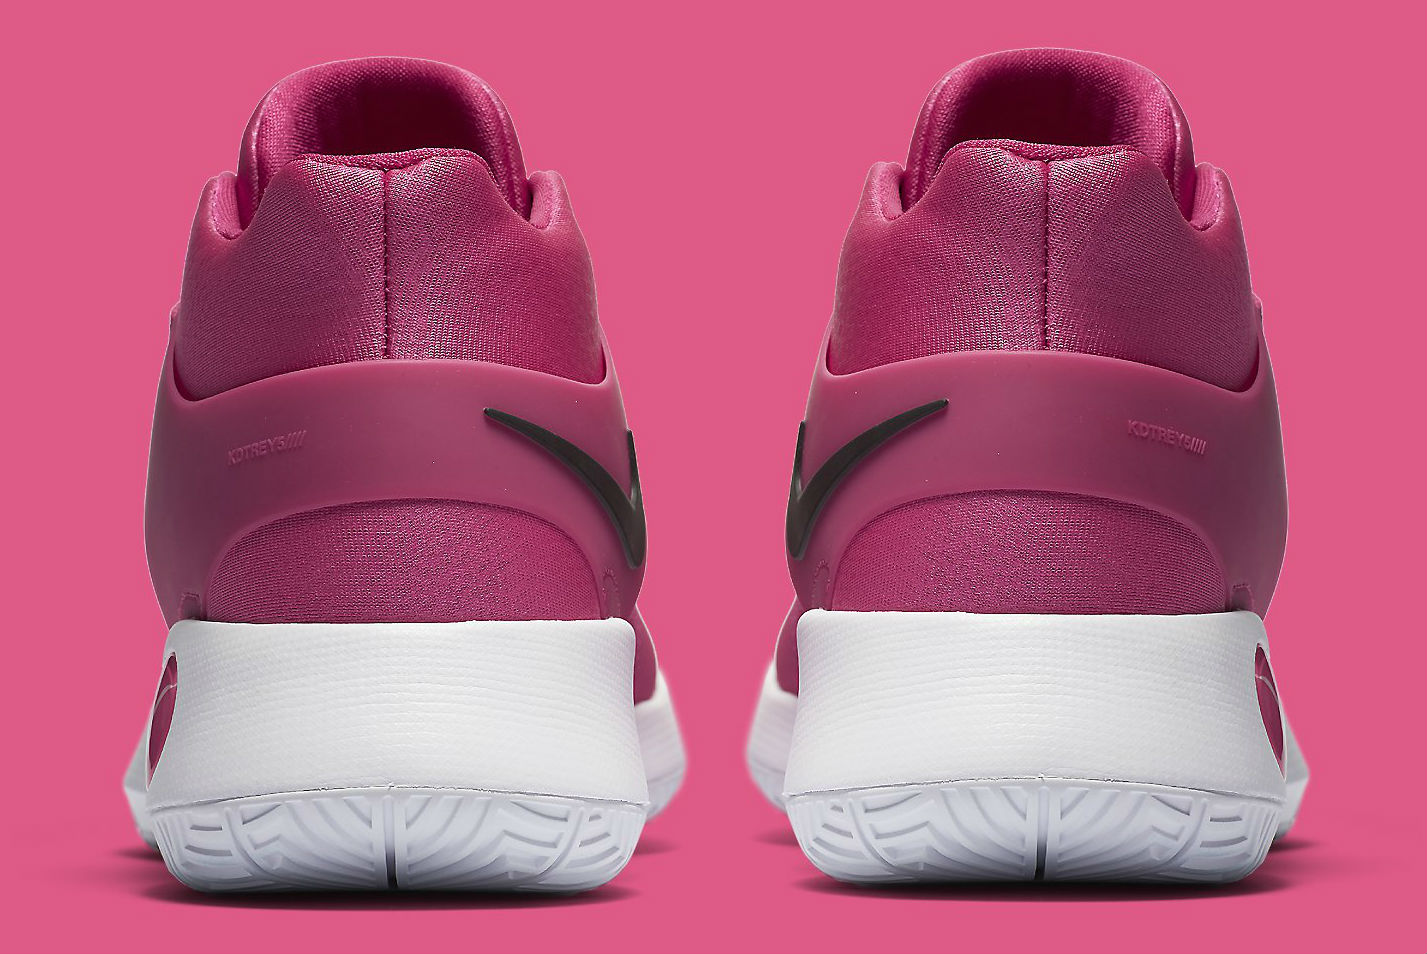 Nike KD Trey 5 IV Think Pink Breast Cancer Kay Yow Heel 844573-606